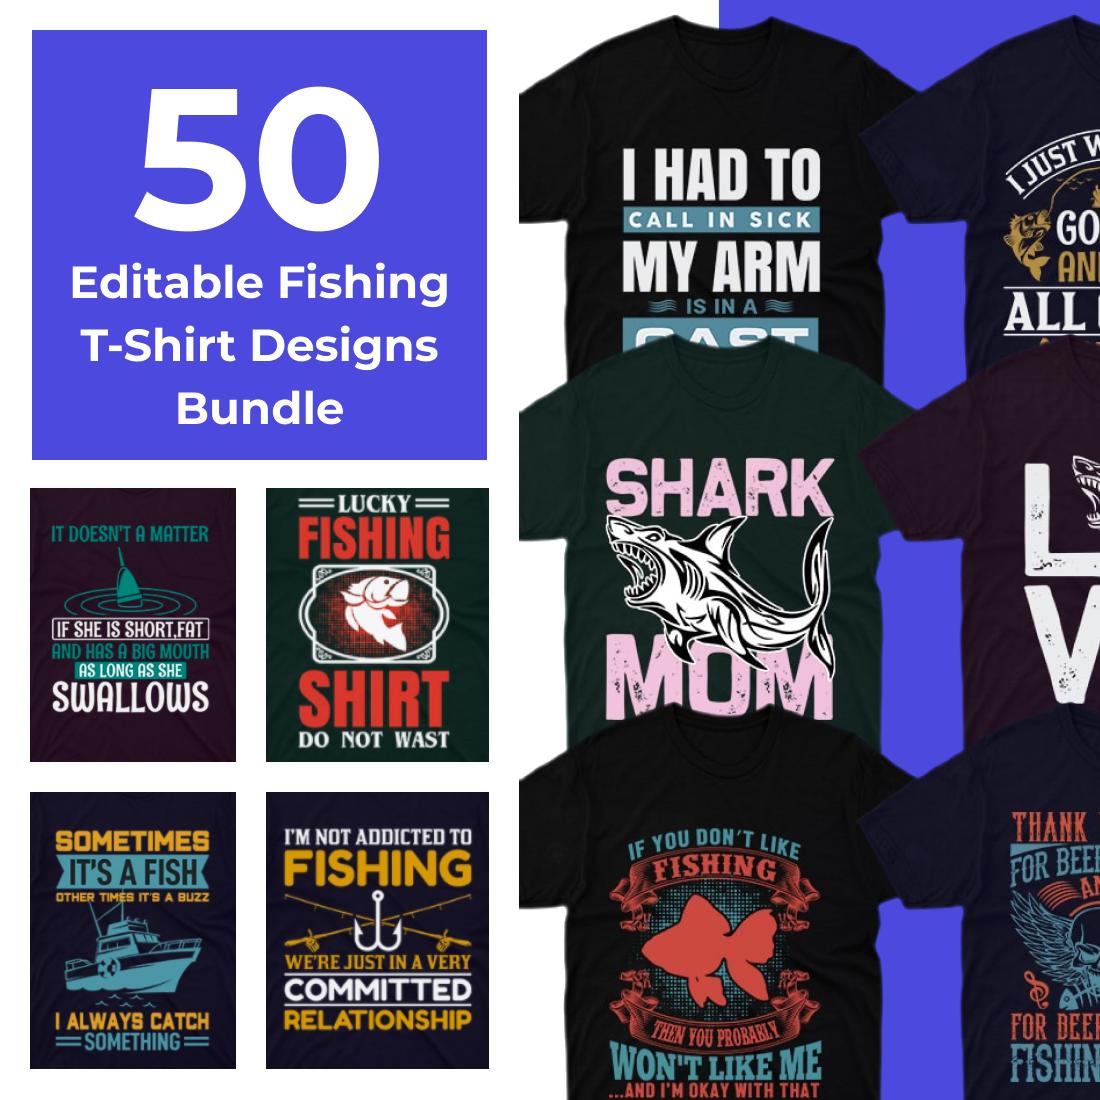 50 Editable Fishing T Shirt Designs Bundle cover.